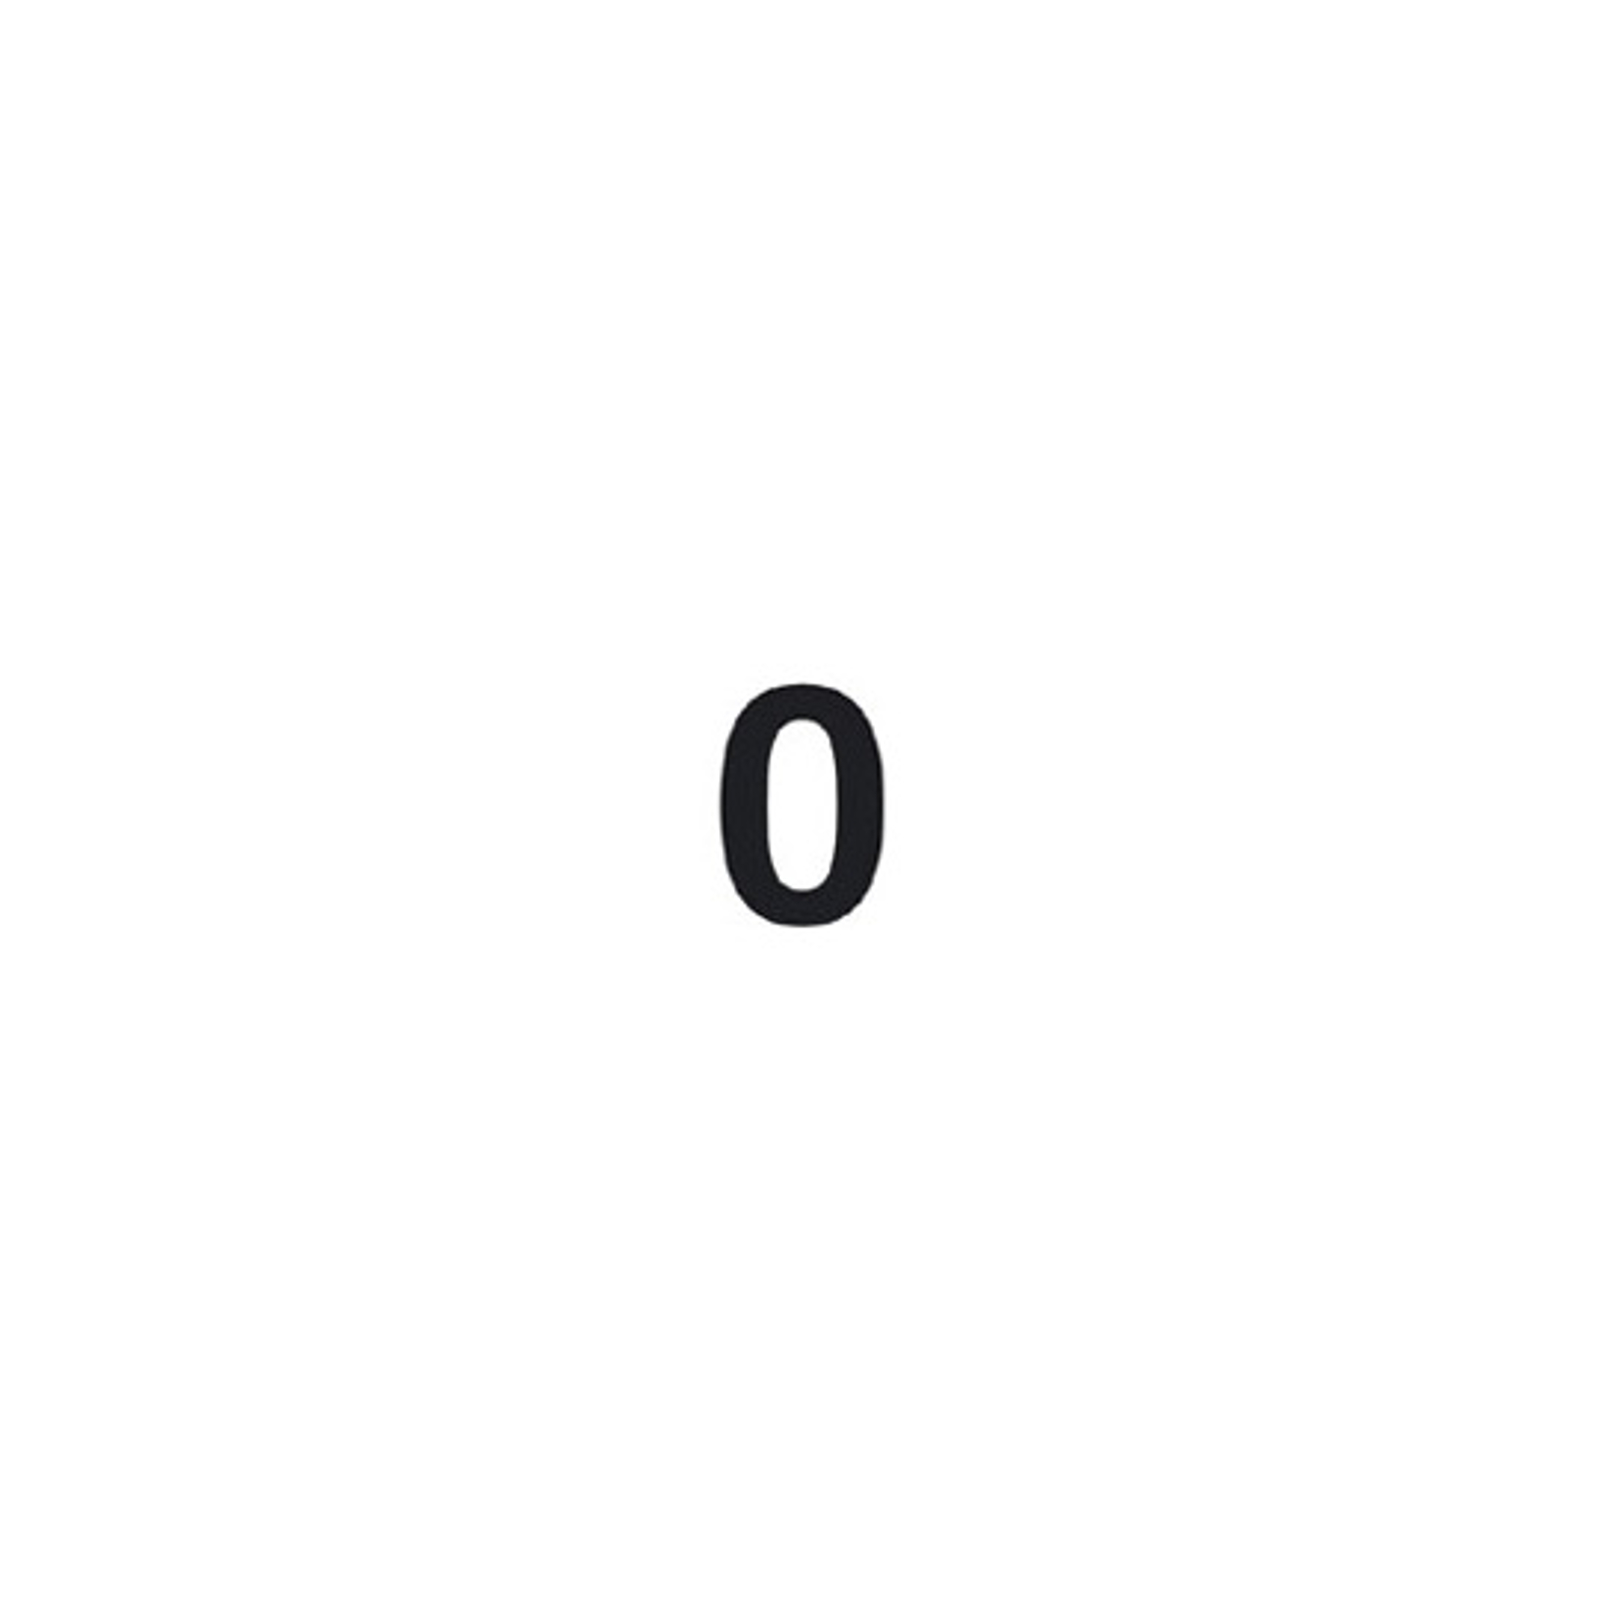 Selbstklebende Ziffer 0